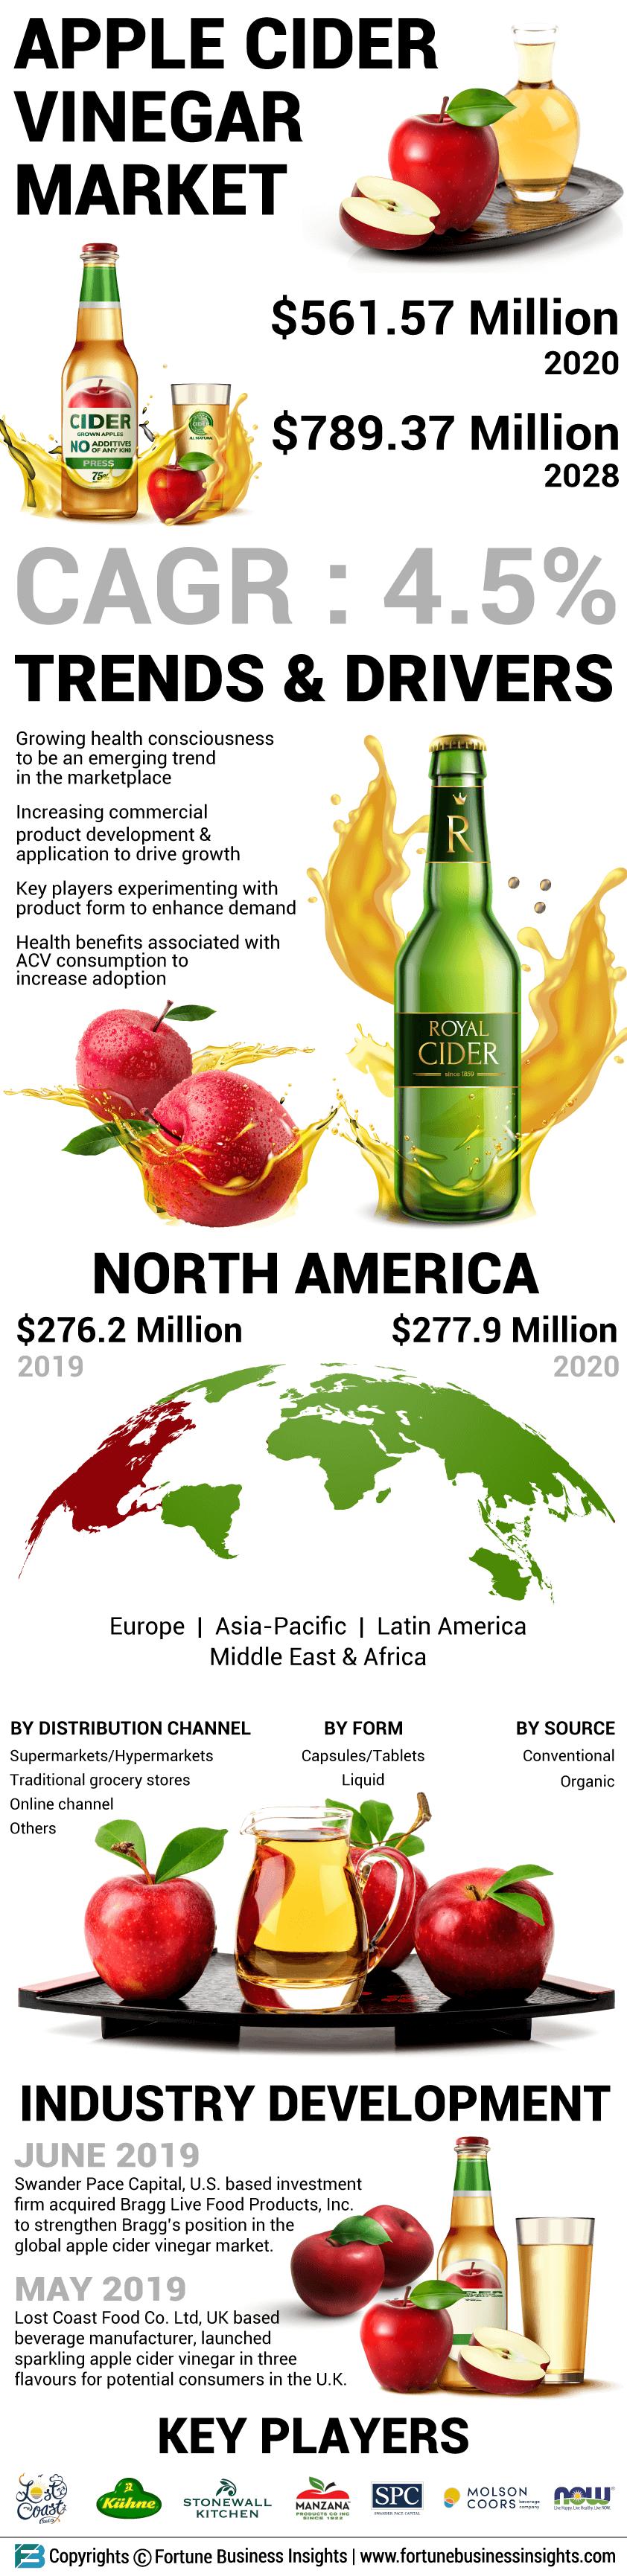 Apple Cider Vinegar Market